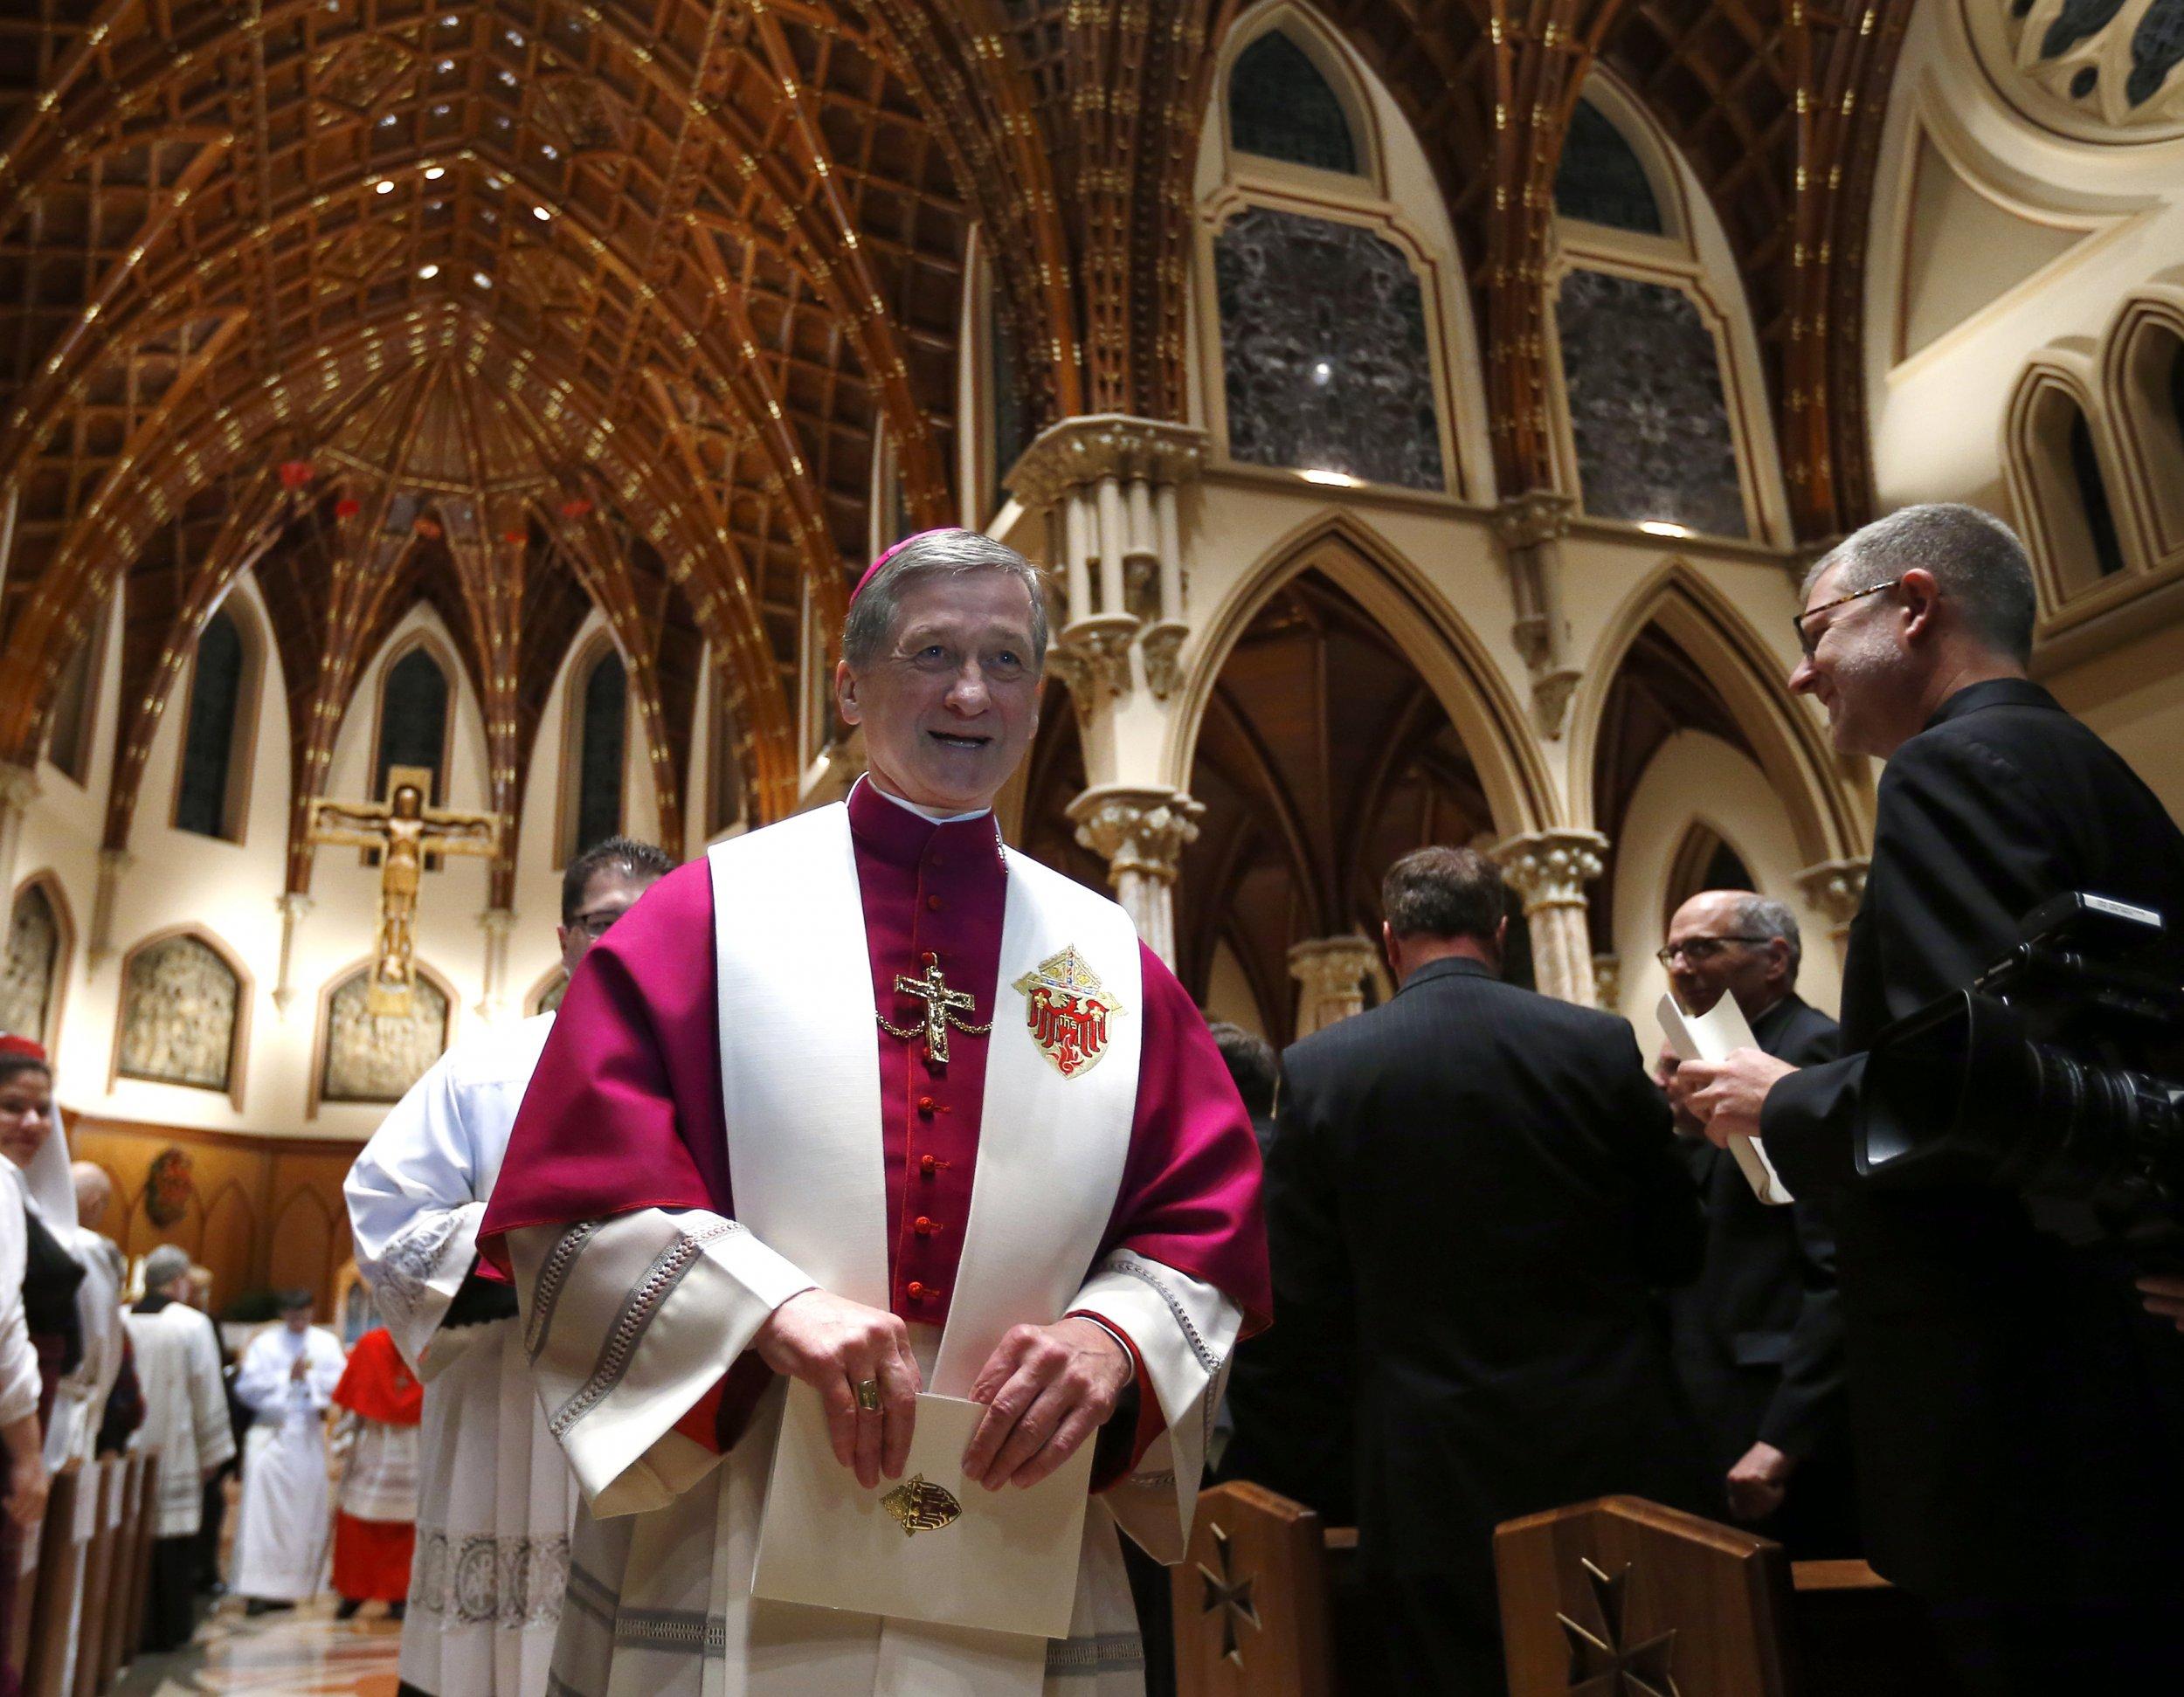 Conservative catholic sites